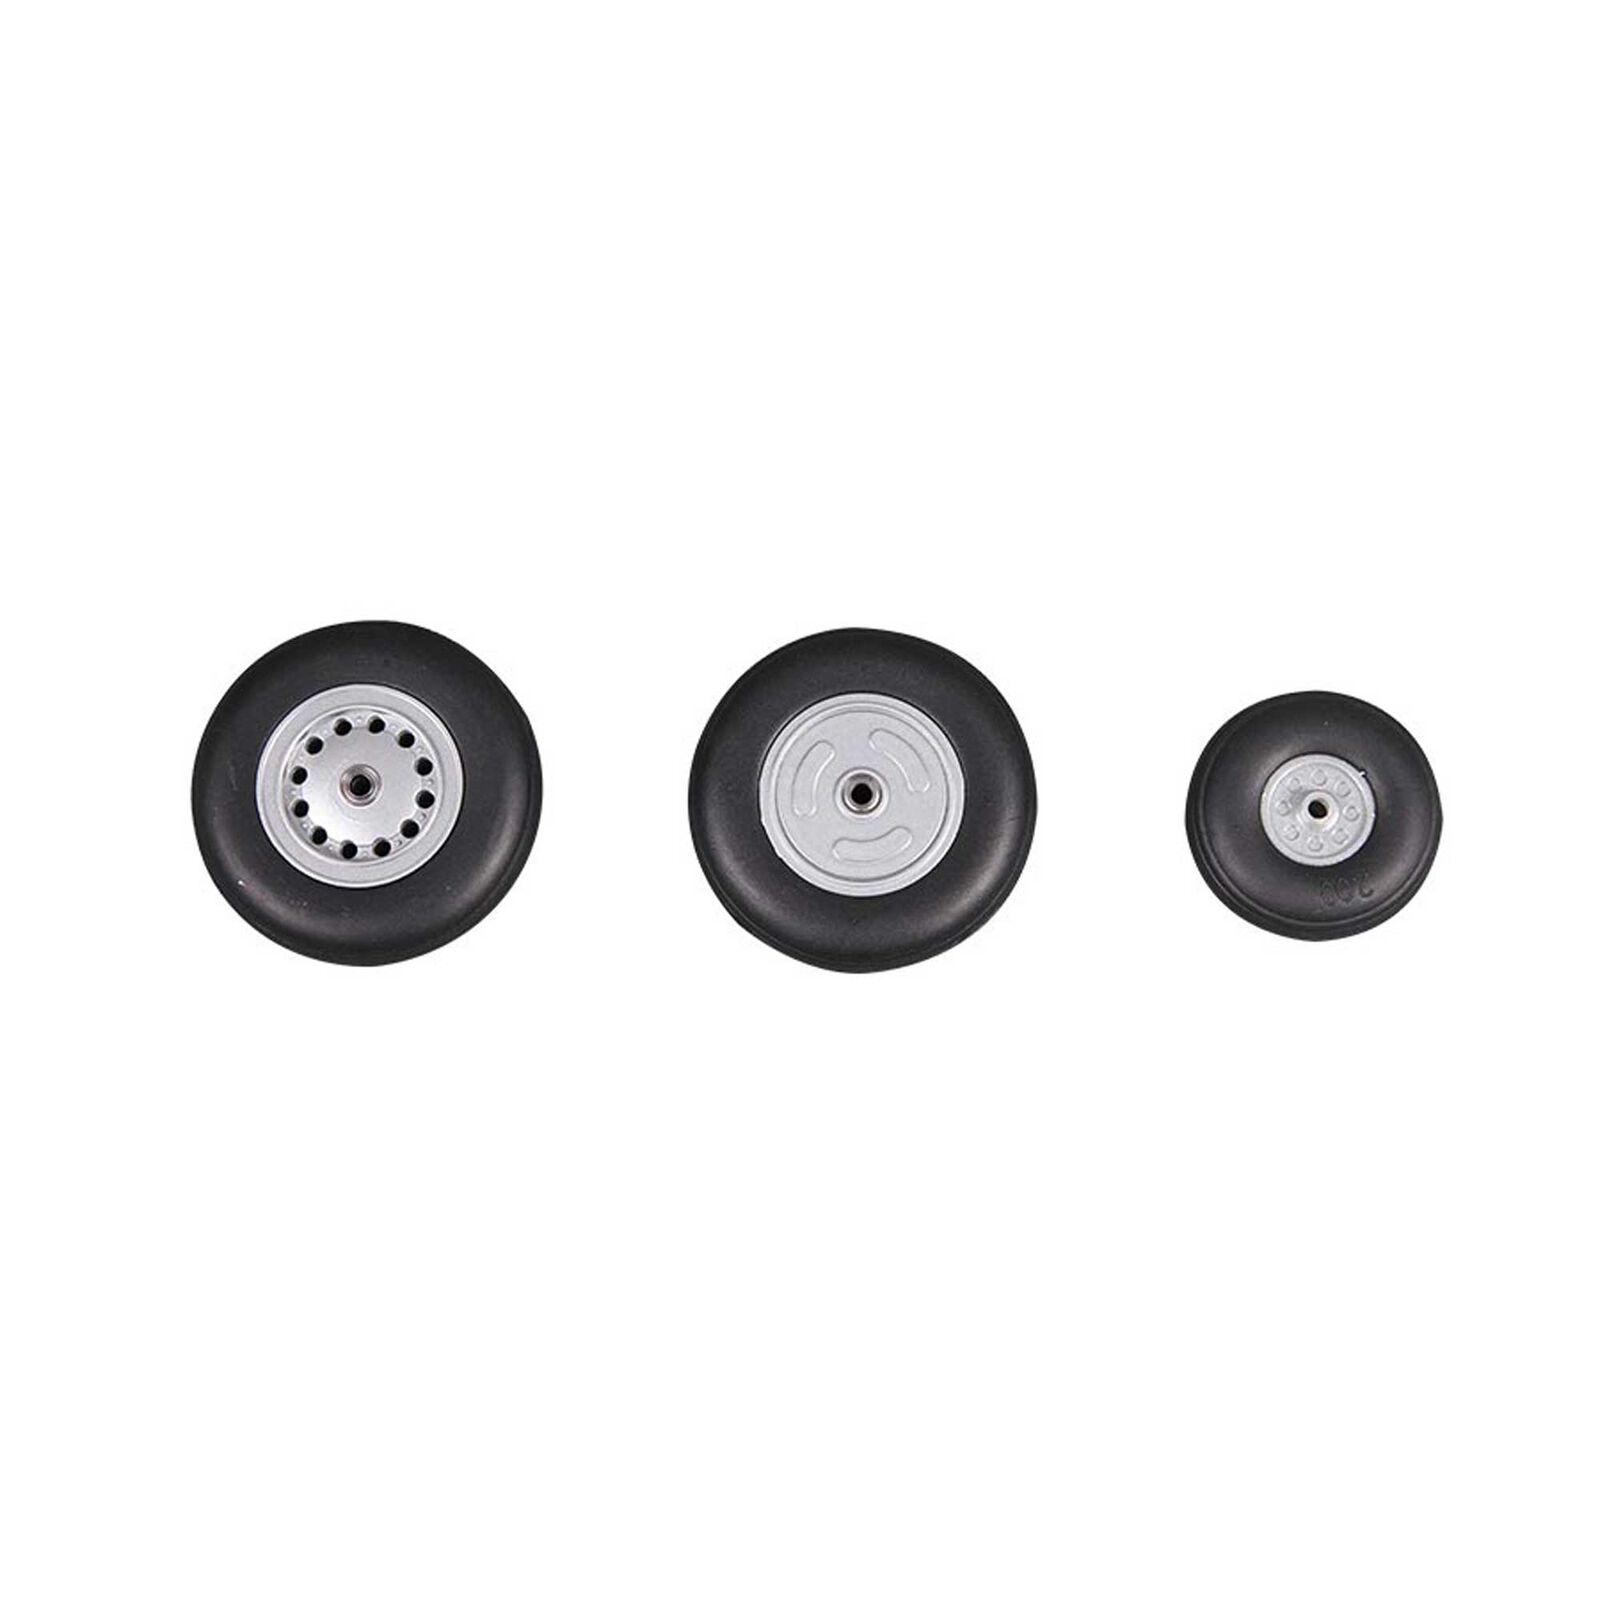 Wheel Set: A-10 V2 70mm EDF PNP